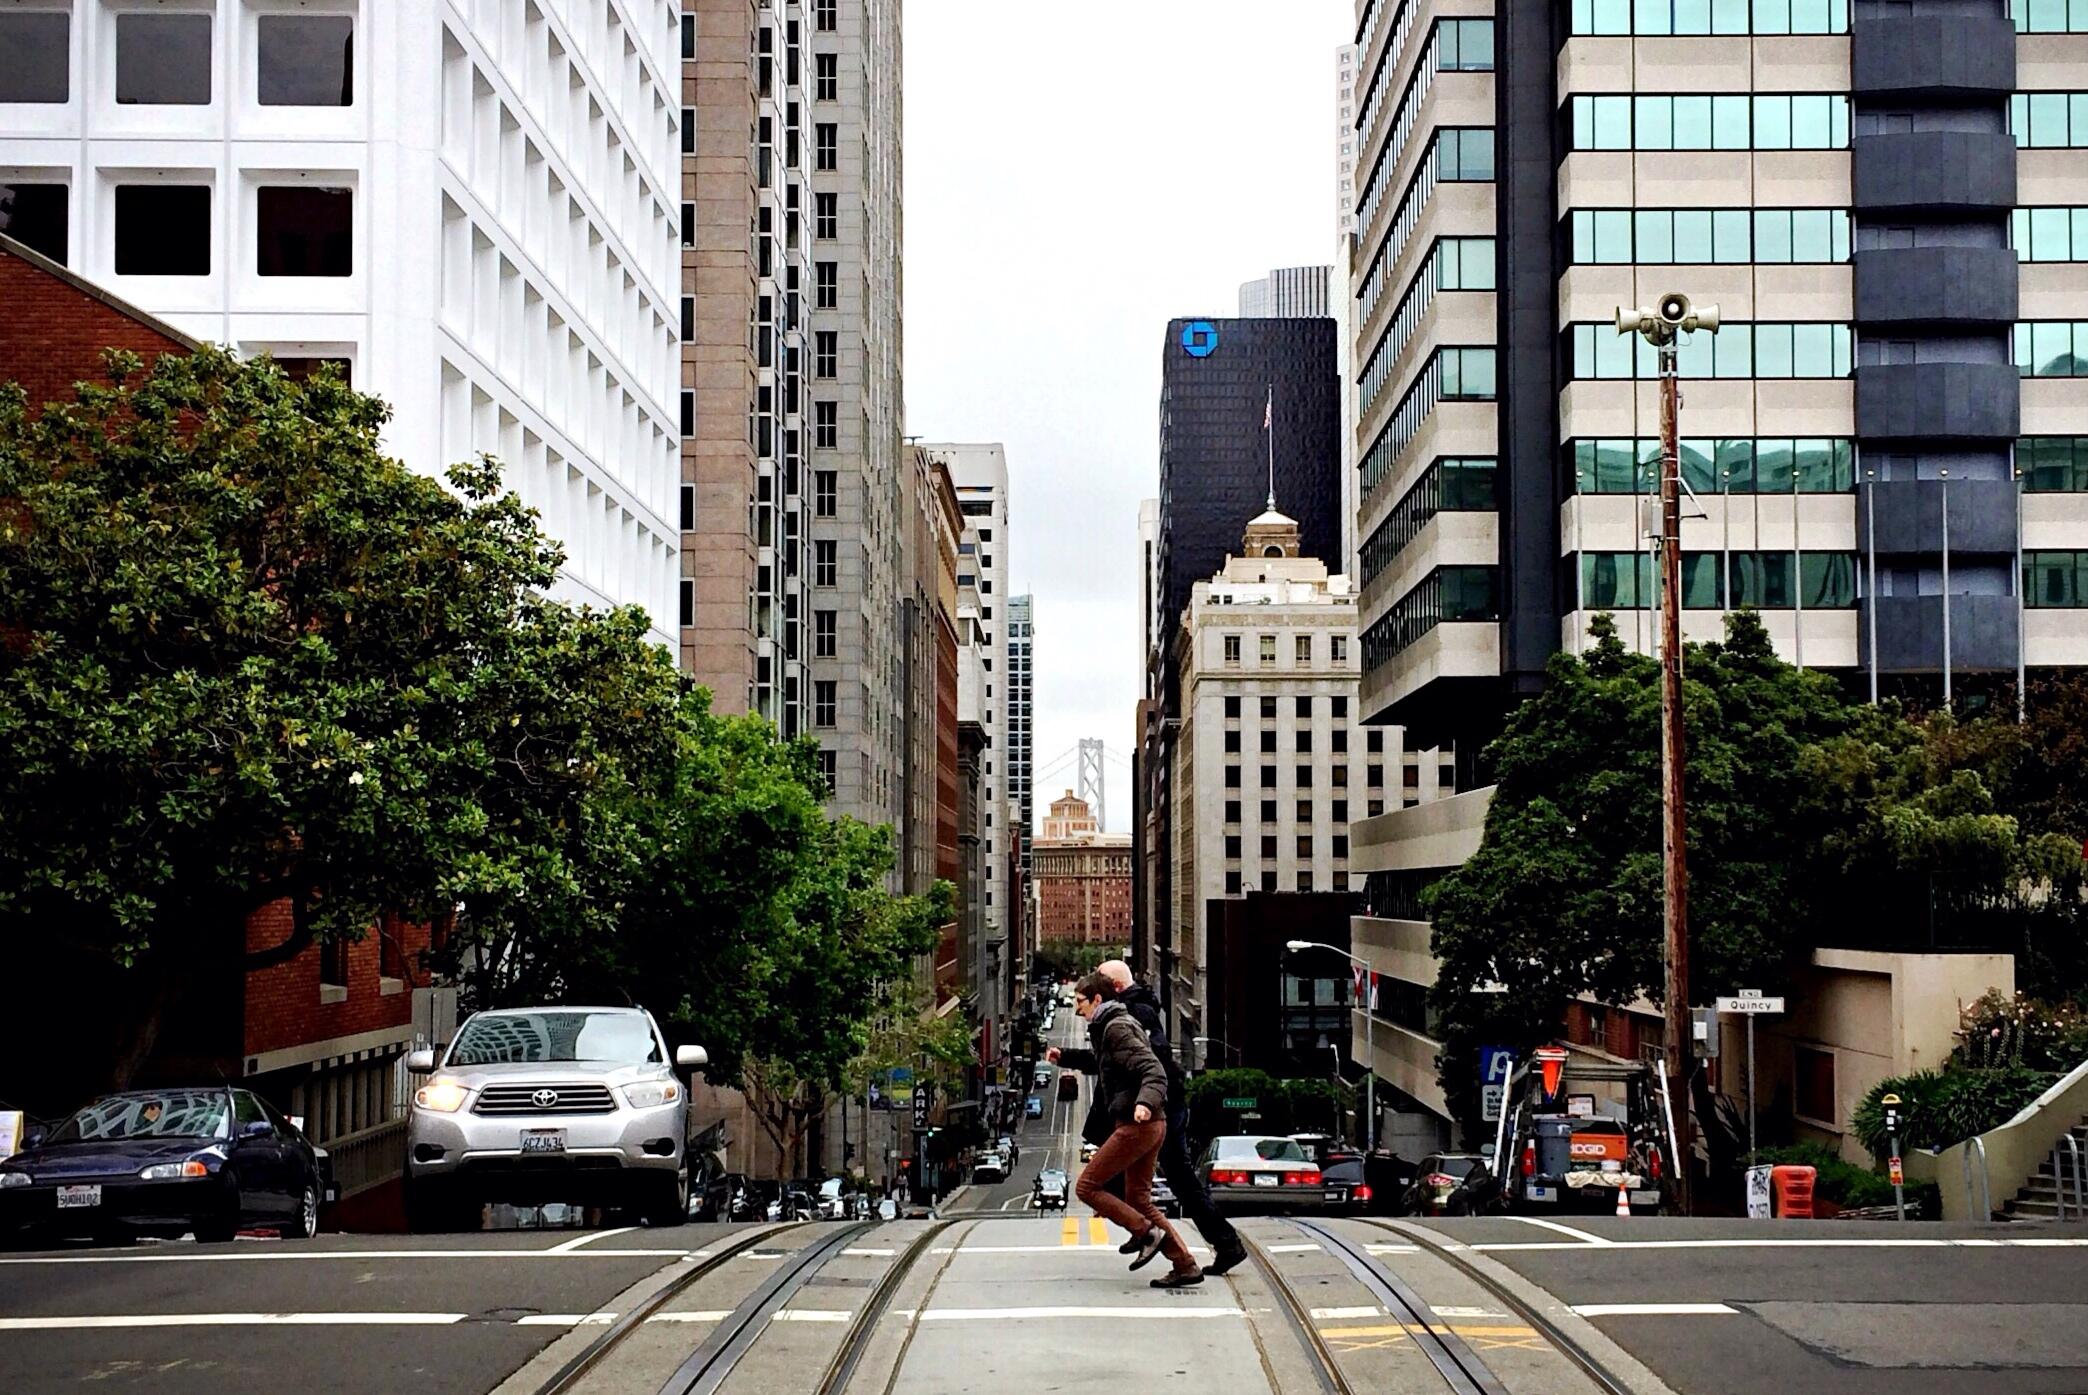 Pedestrians in Chinatown, San Francisco, California.